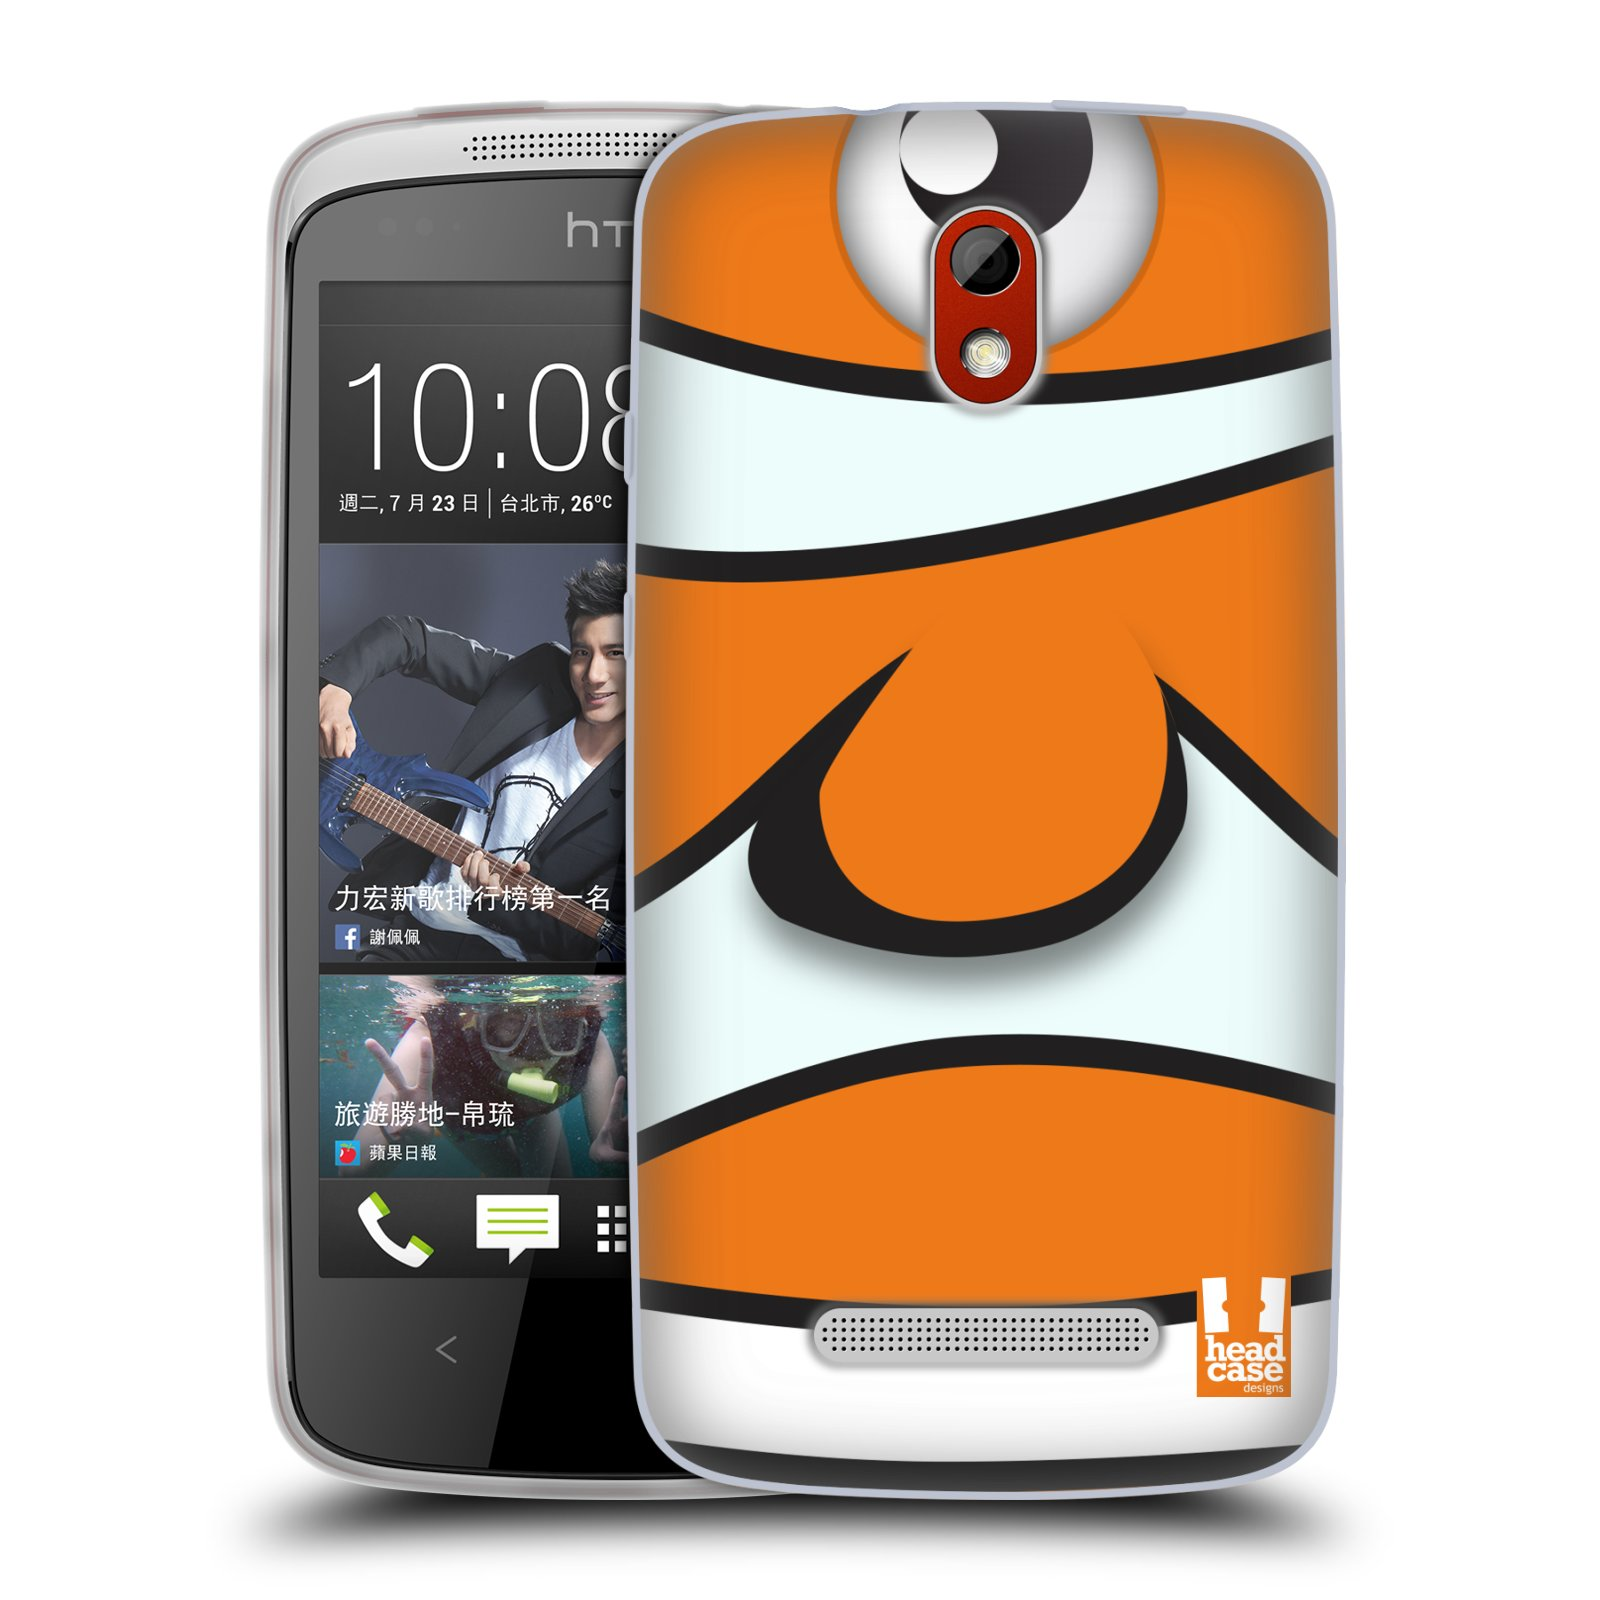 HEAD CASE silikonový obal na mobil HTC DESIRE 500 vzor Rybičky z profilu klaun oranžová NEMO